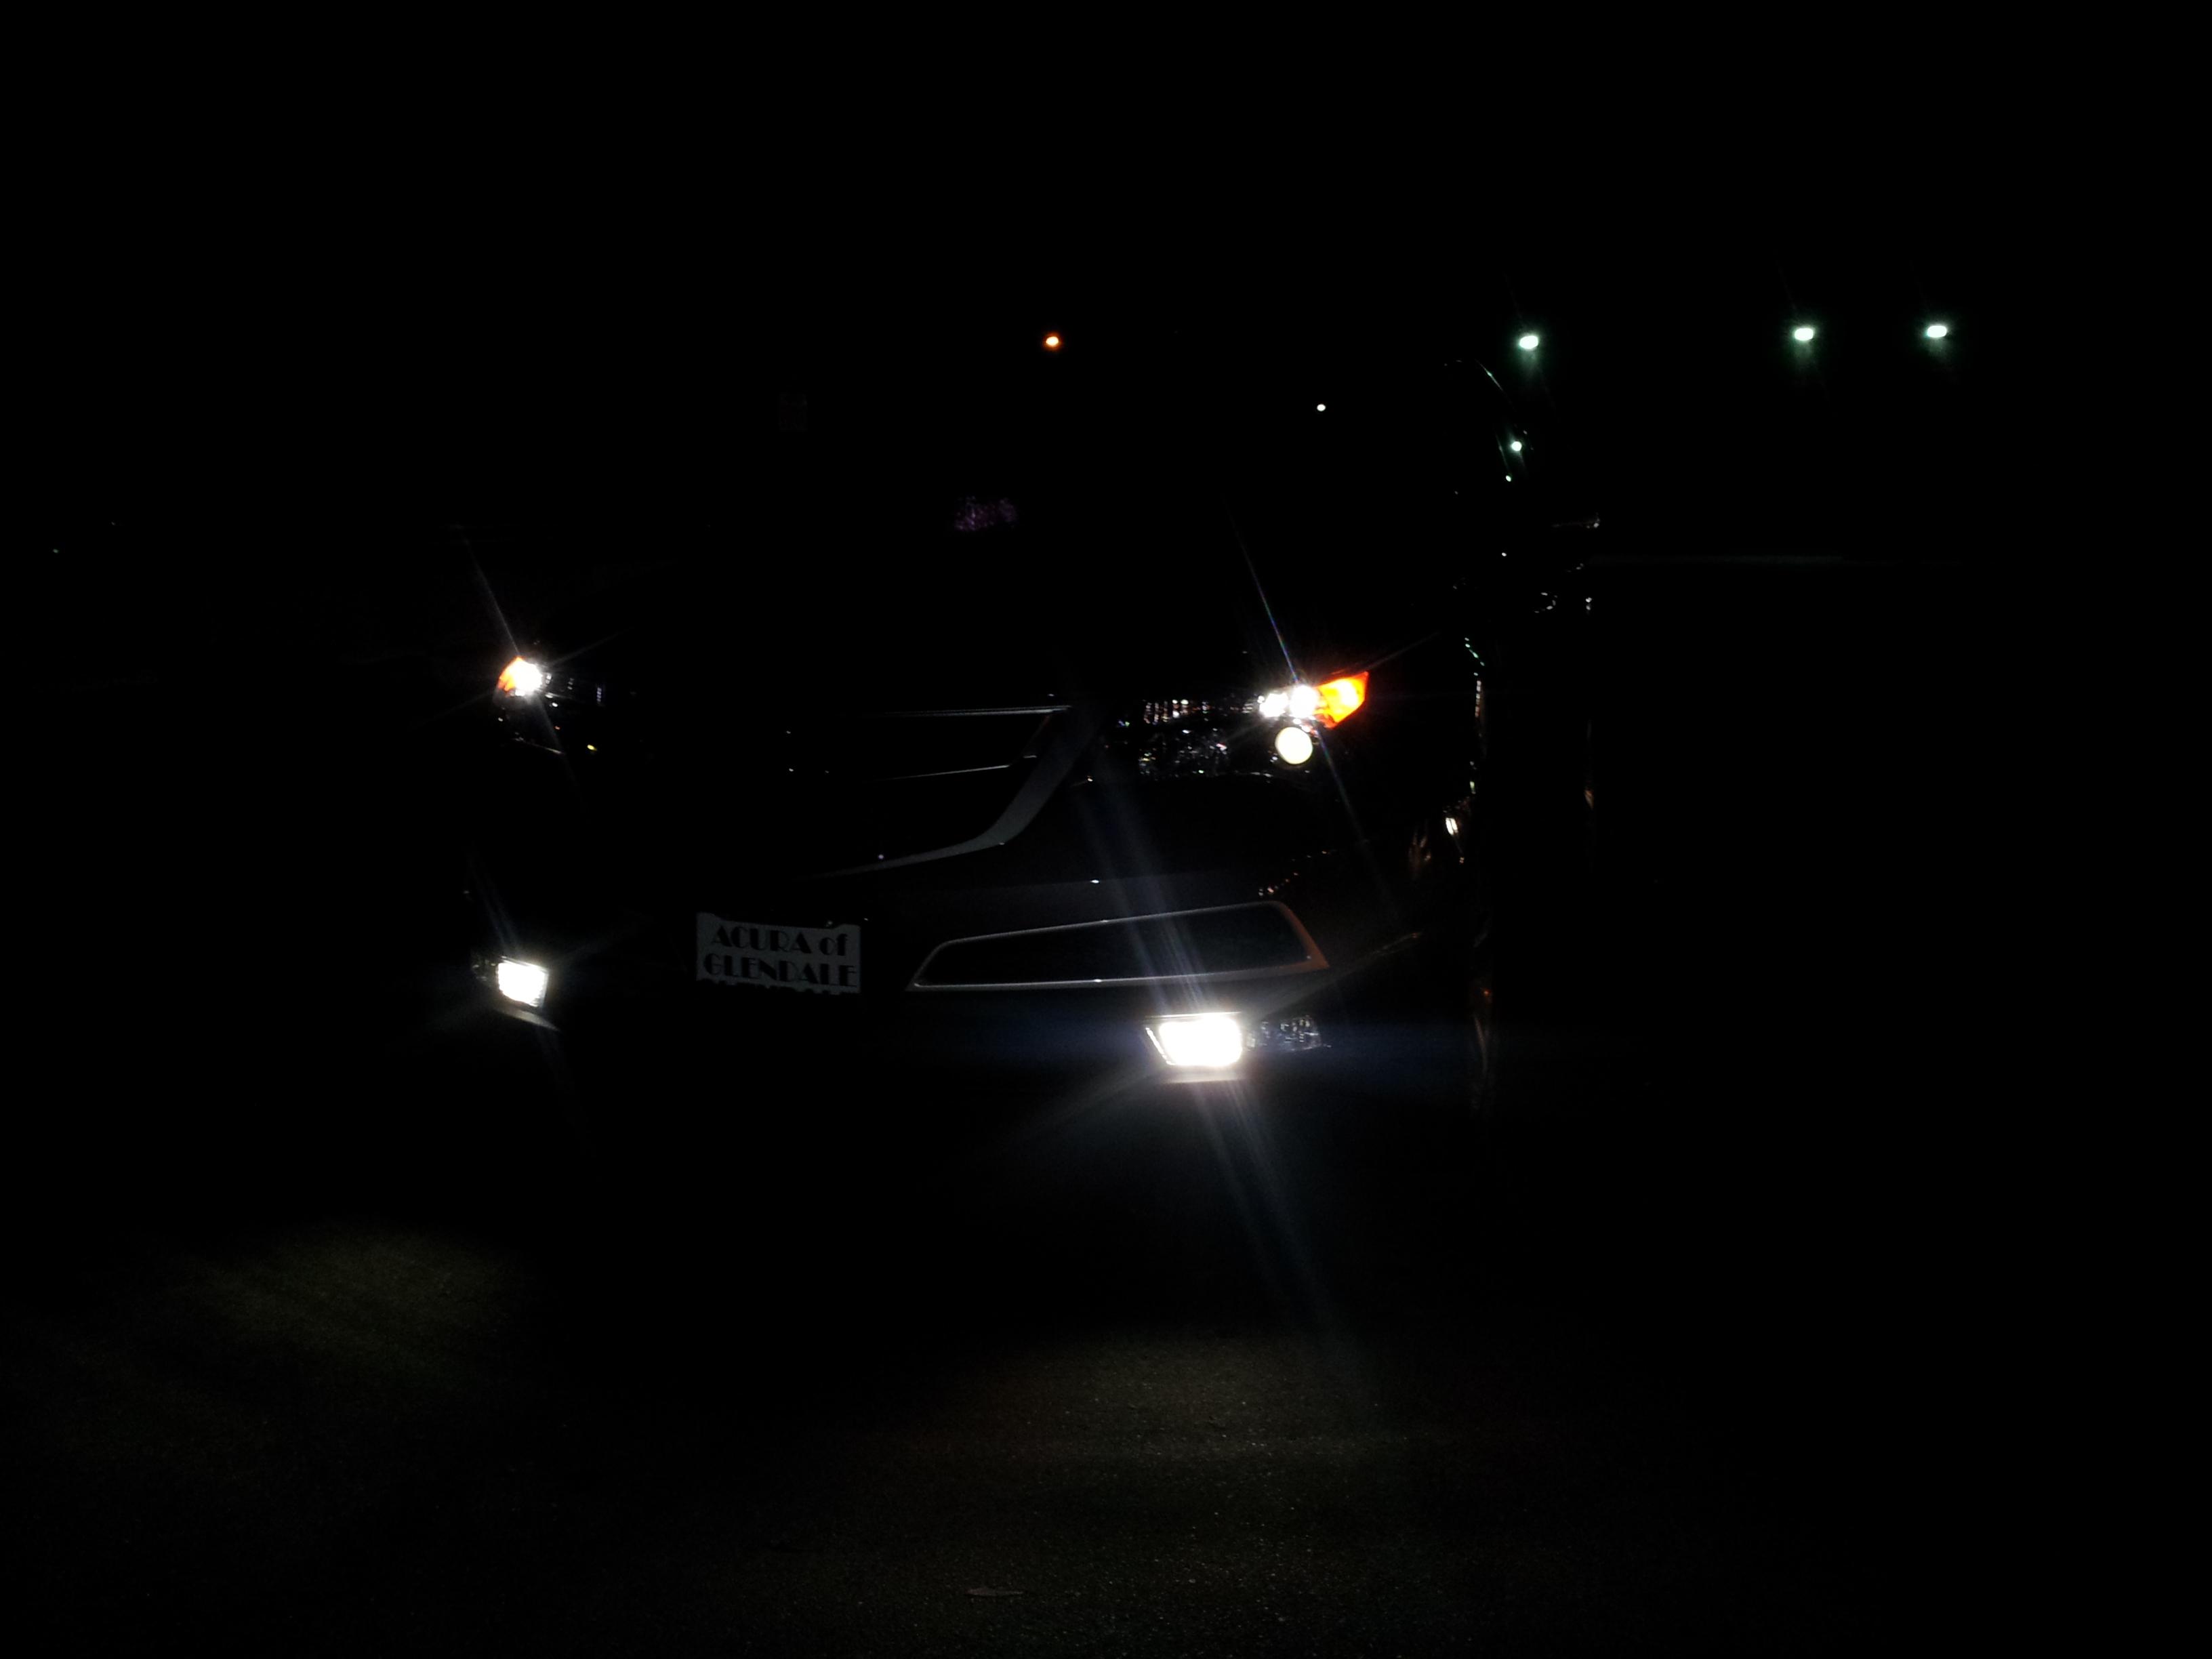 HID Fog/LED DRL Installed - PICS-20121025_214320.jpg